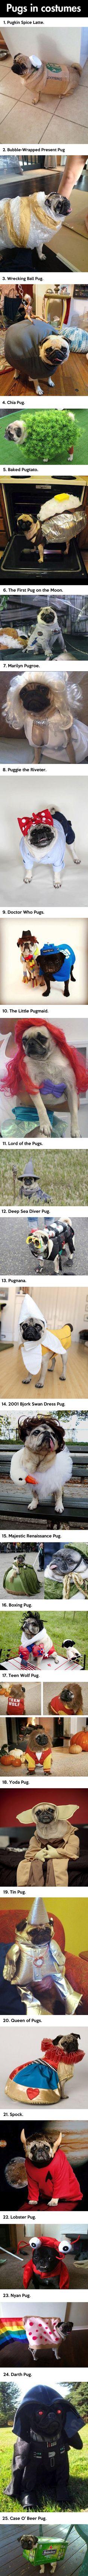 Hahahahahhahaha. OMG OMG. Hahahahahahhahahaha